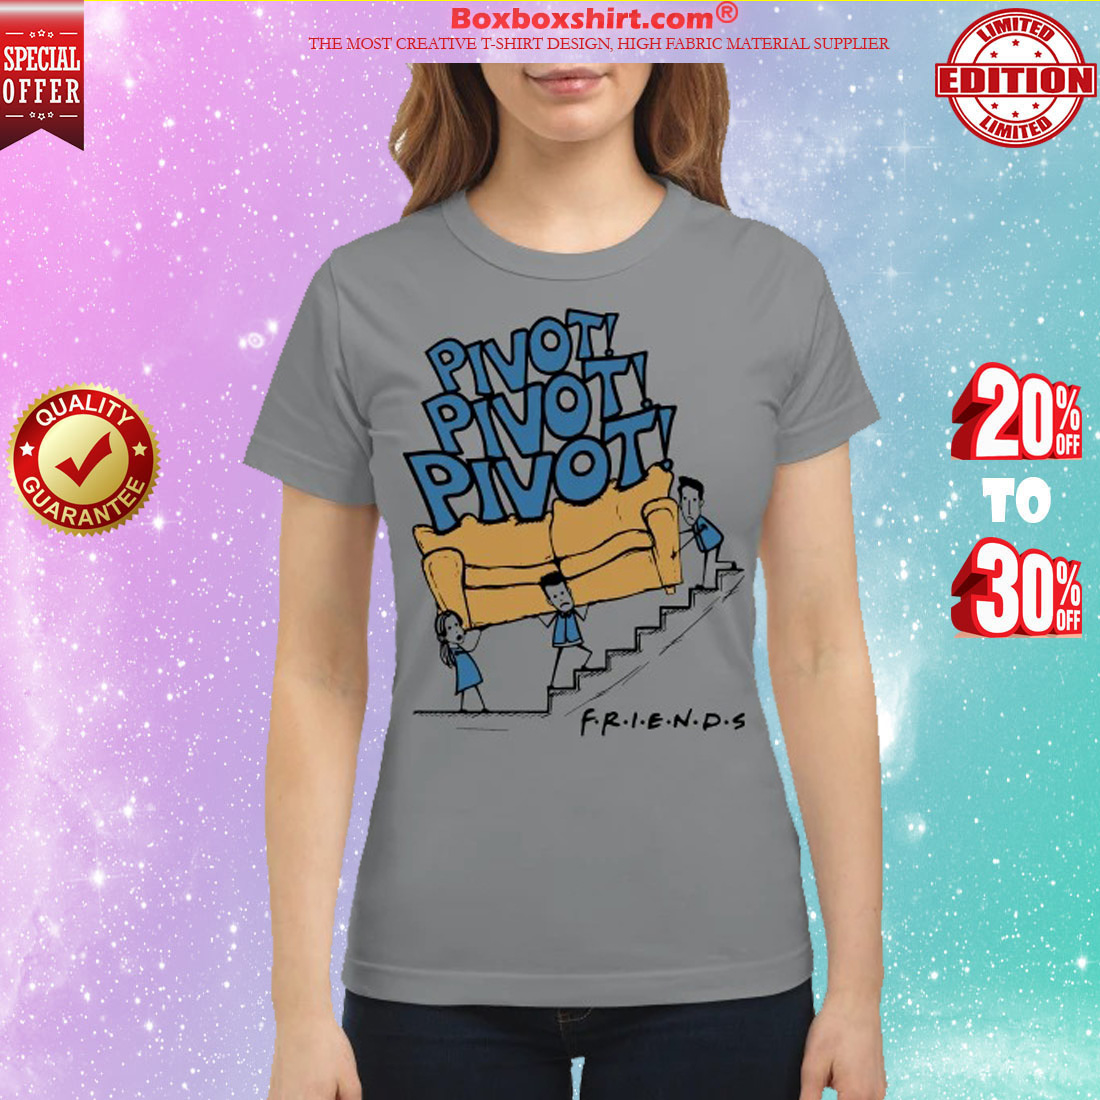 Pivot pivot pivot Friends classic shirt